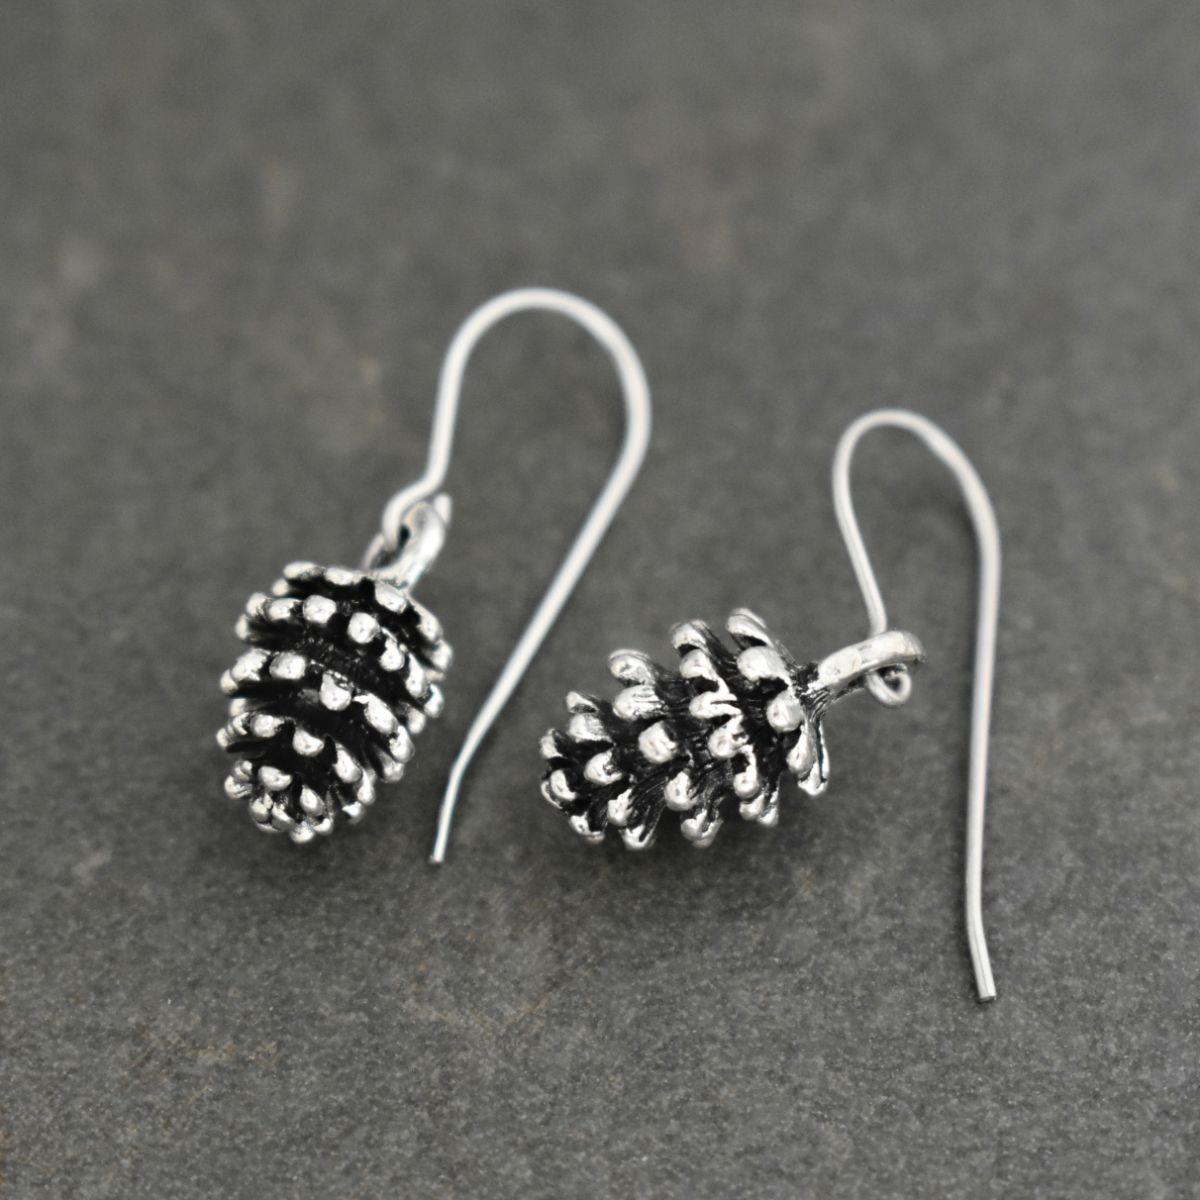 White fir pine cone earrings